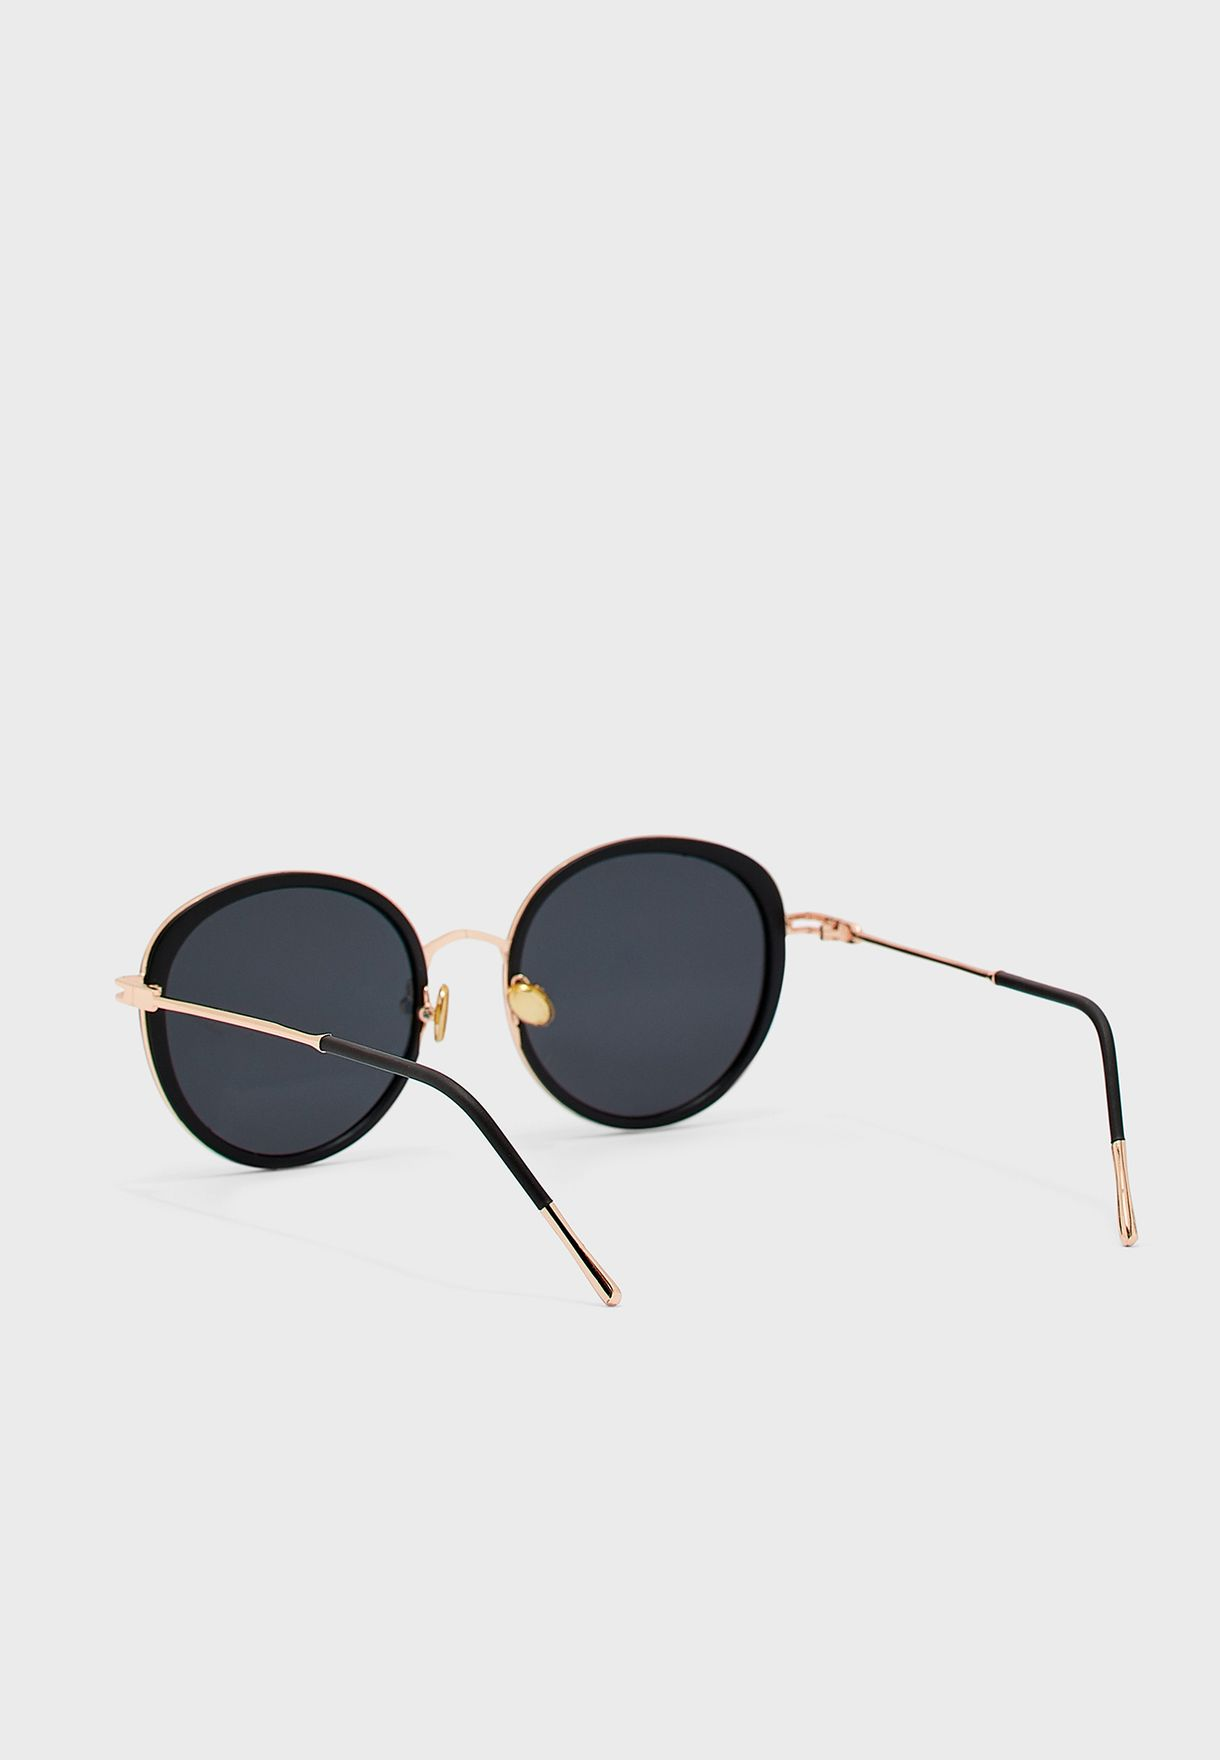 Oversized Round Matt Frame Sunglasses With Gold Trim  (POLARIZED )